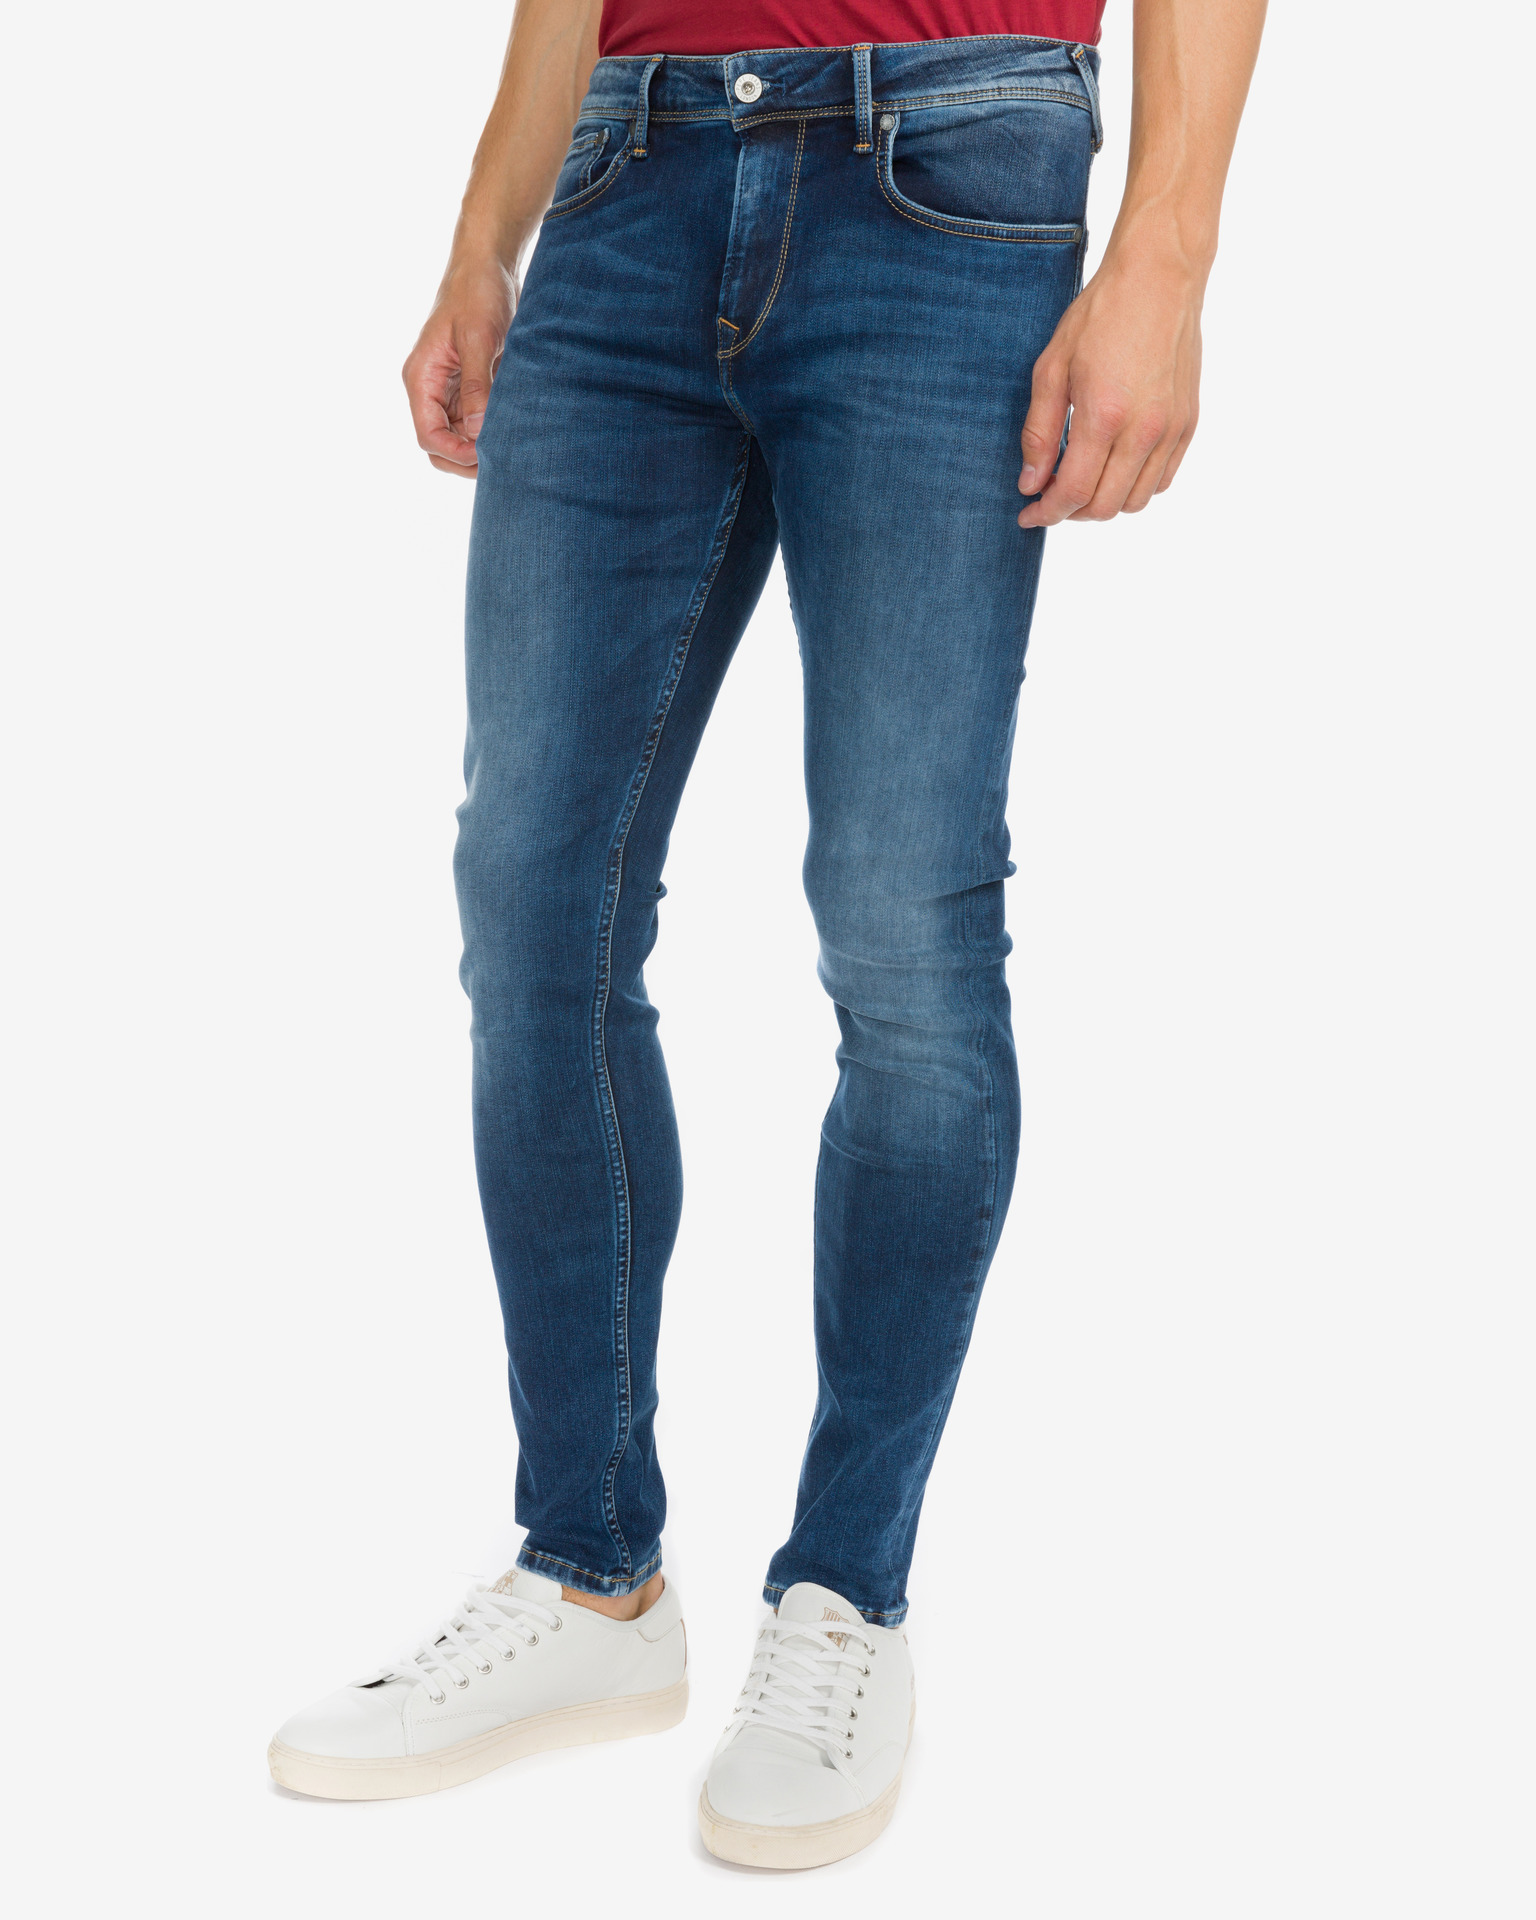 Pepe Jeans - Finsbury Farmernadrág  5111f077b8